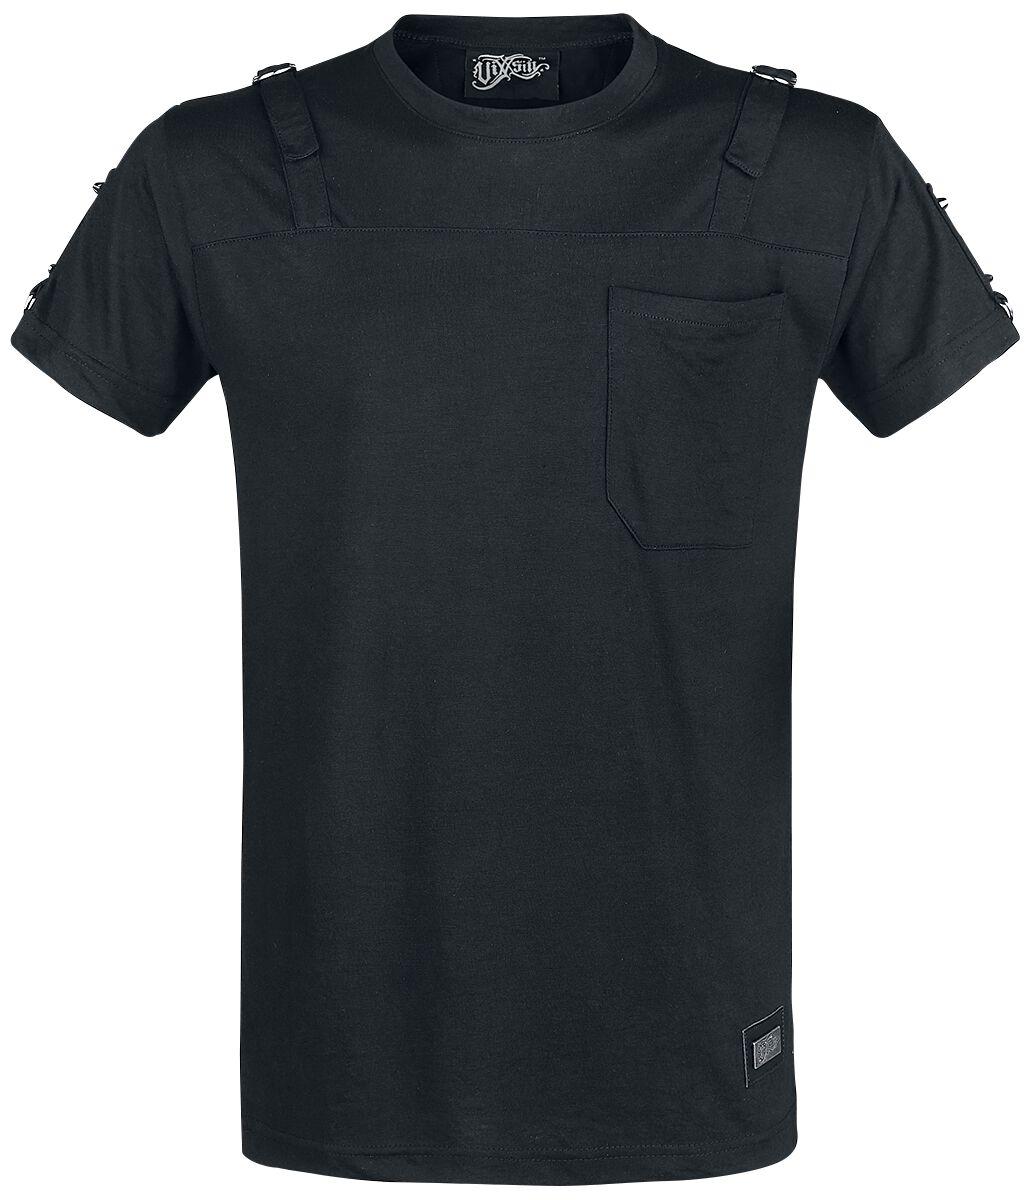 Image of   Vixxsin Ville Top T-Shirt sort